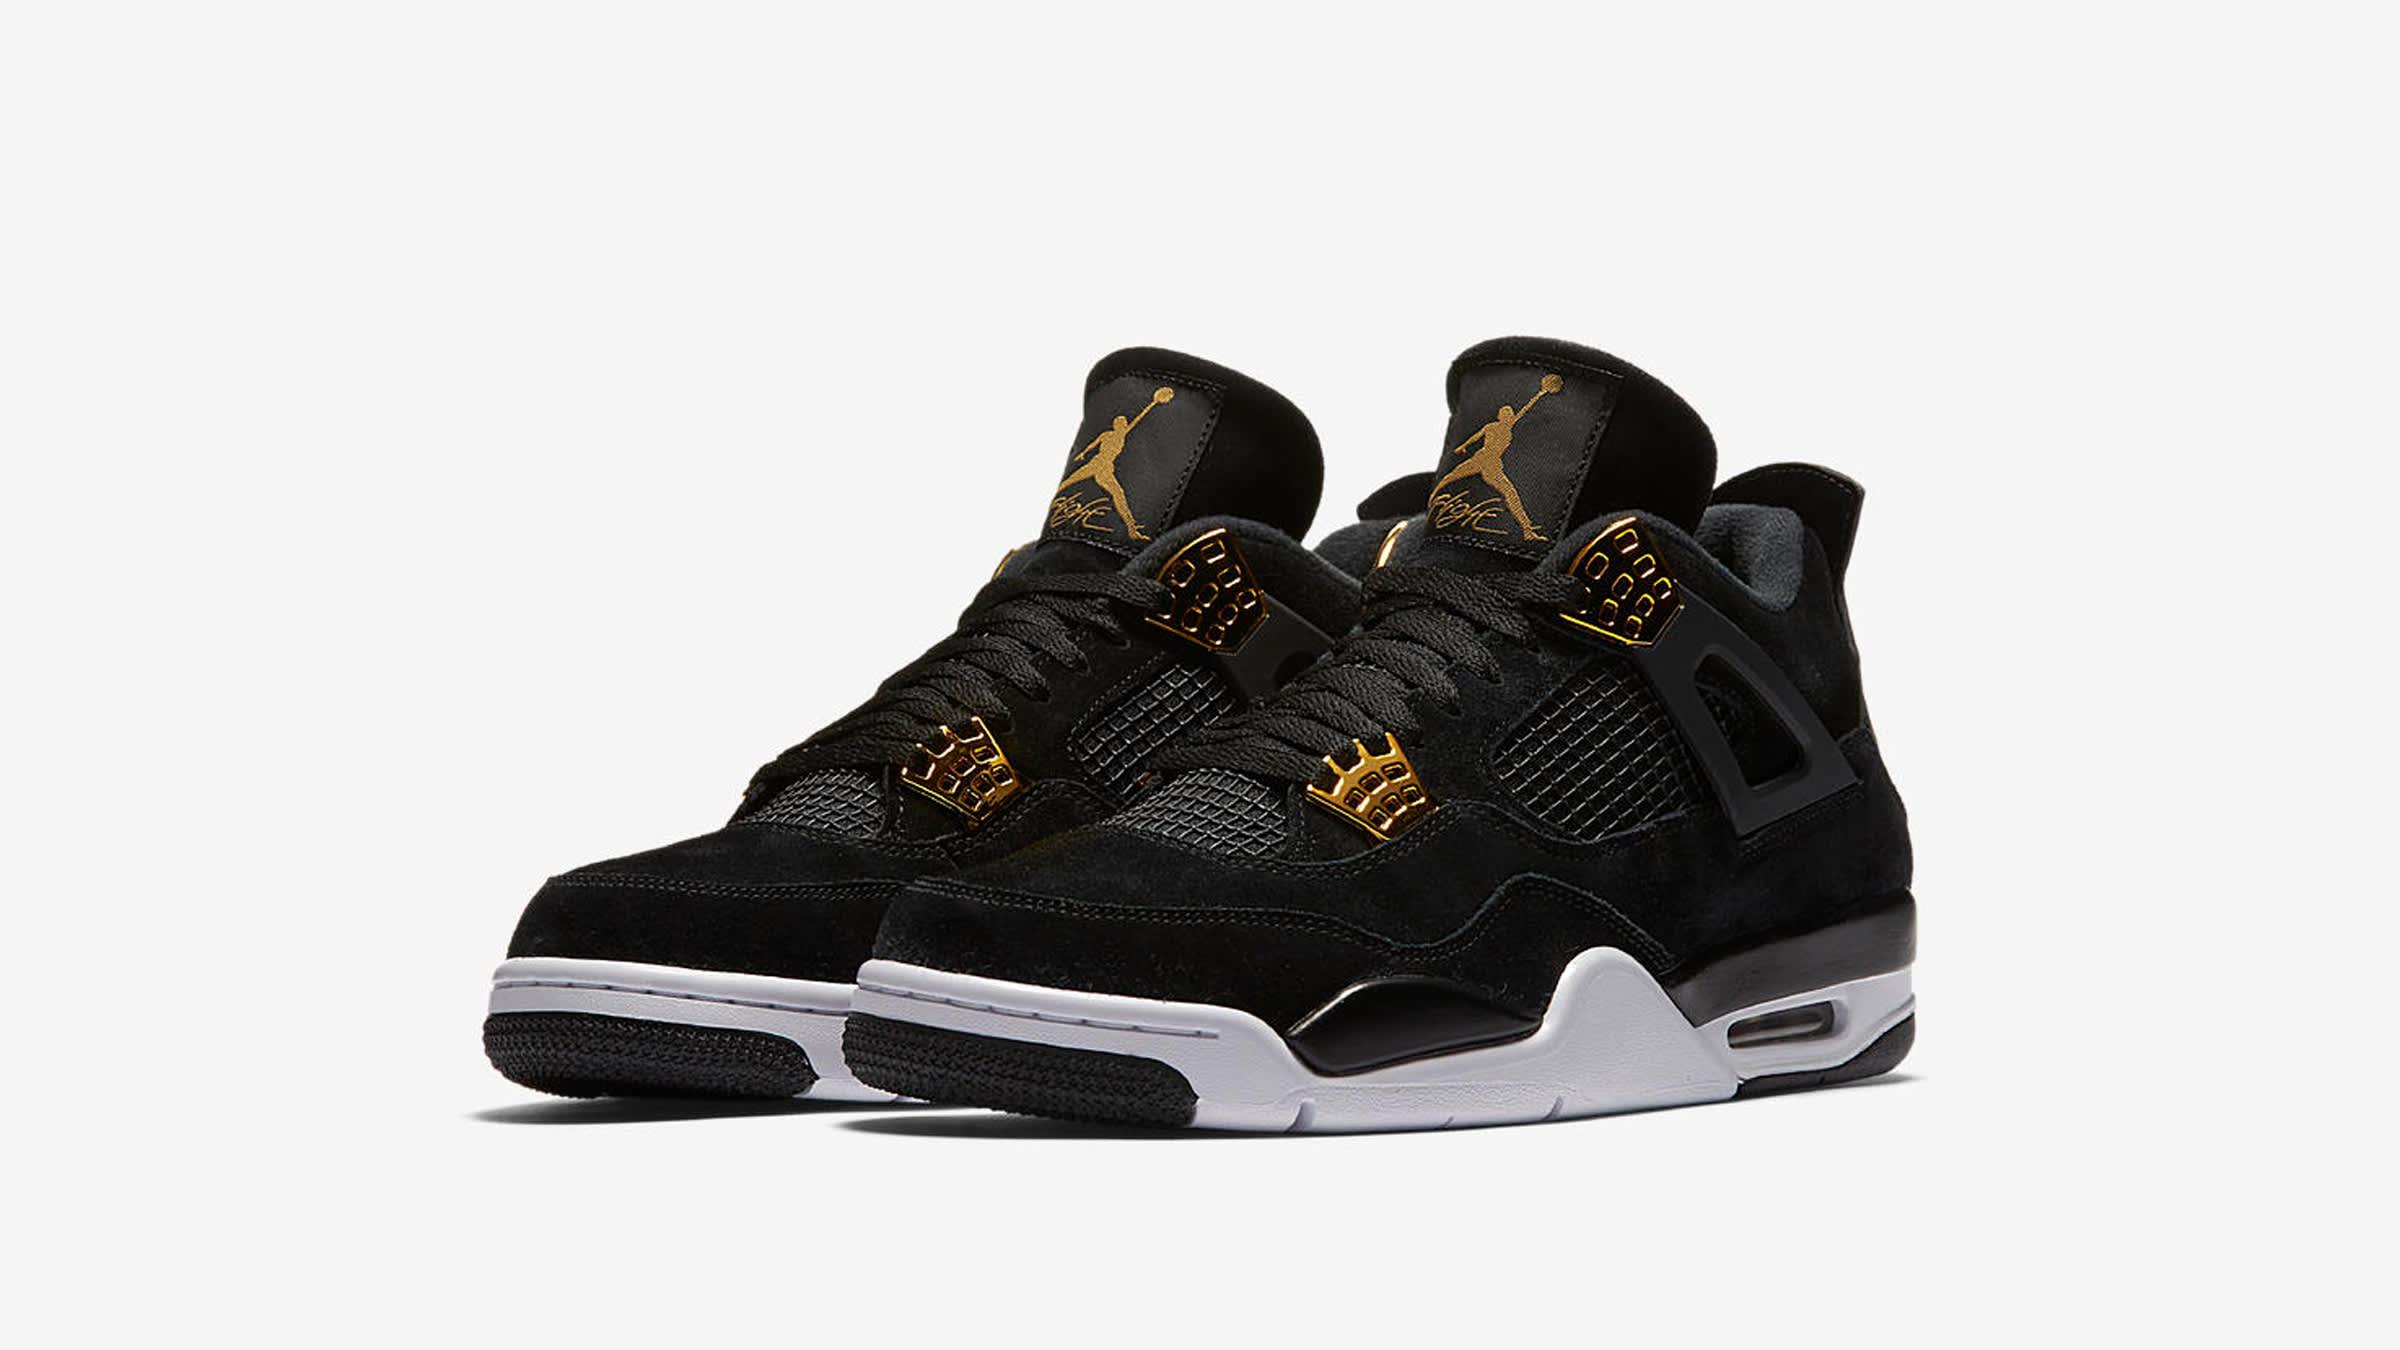 timeless design 8e210 21001 Nike Air Jordan 4 Retro  Royalty  Black, Metallic Gold   White   END.